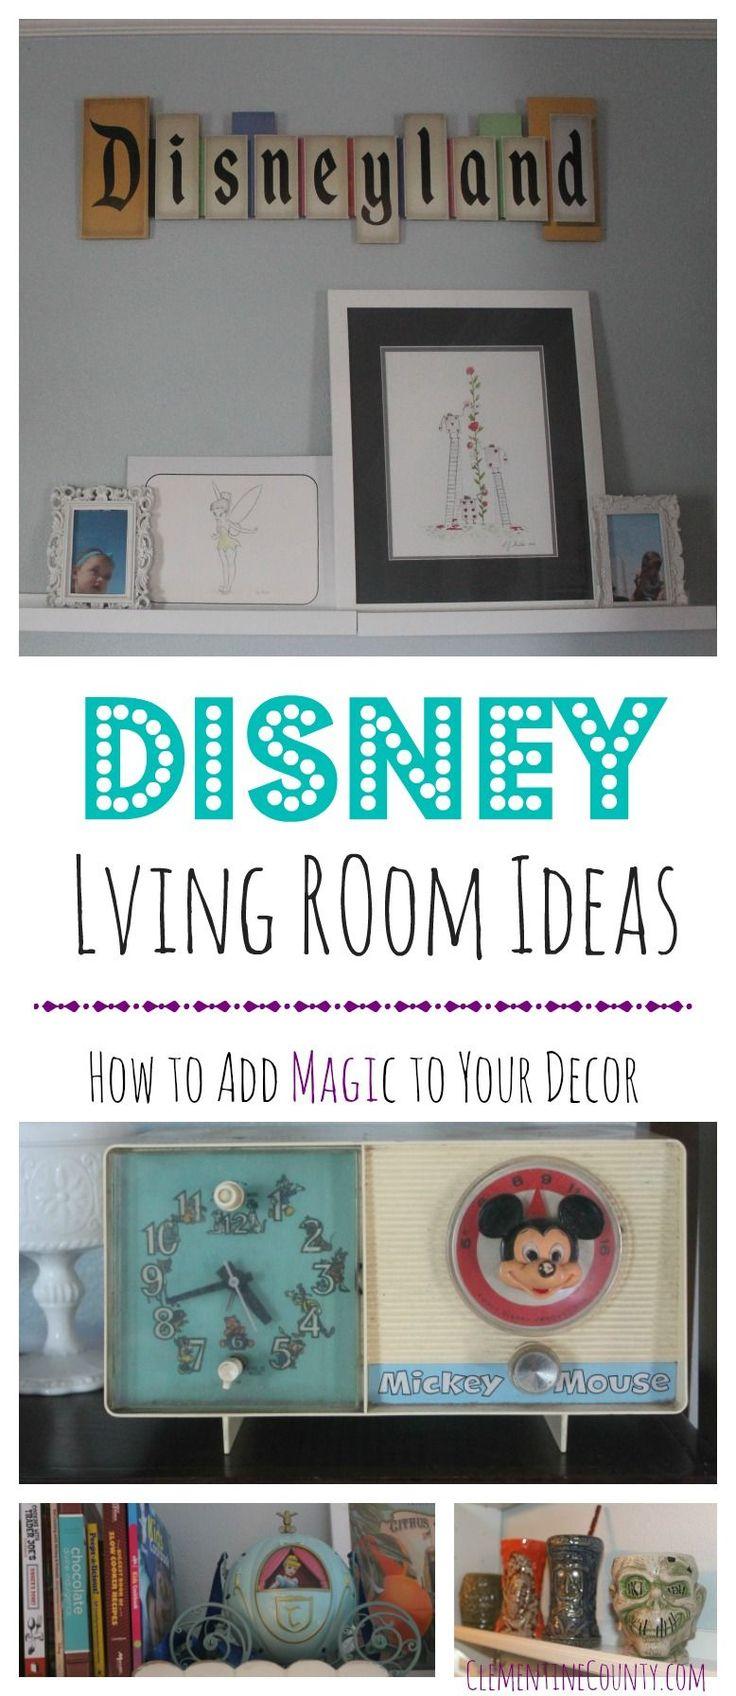 25+ unique Disney room decorations ideas on Pinterest ...